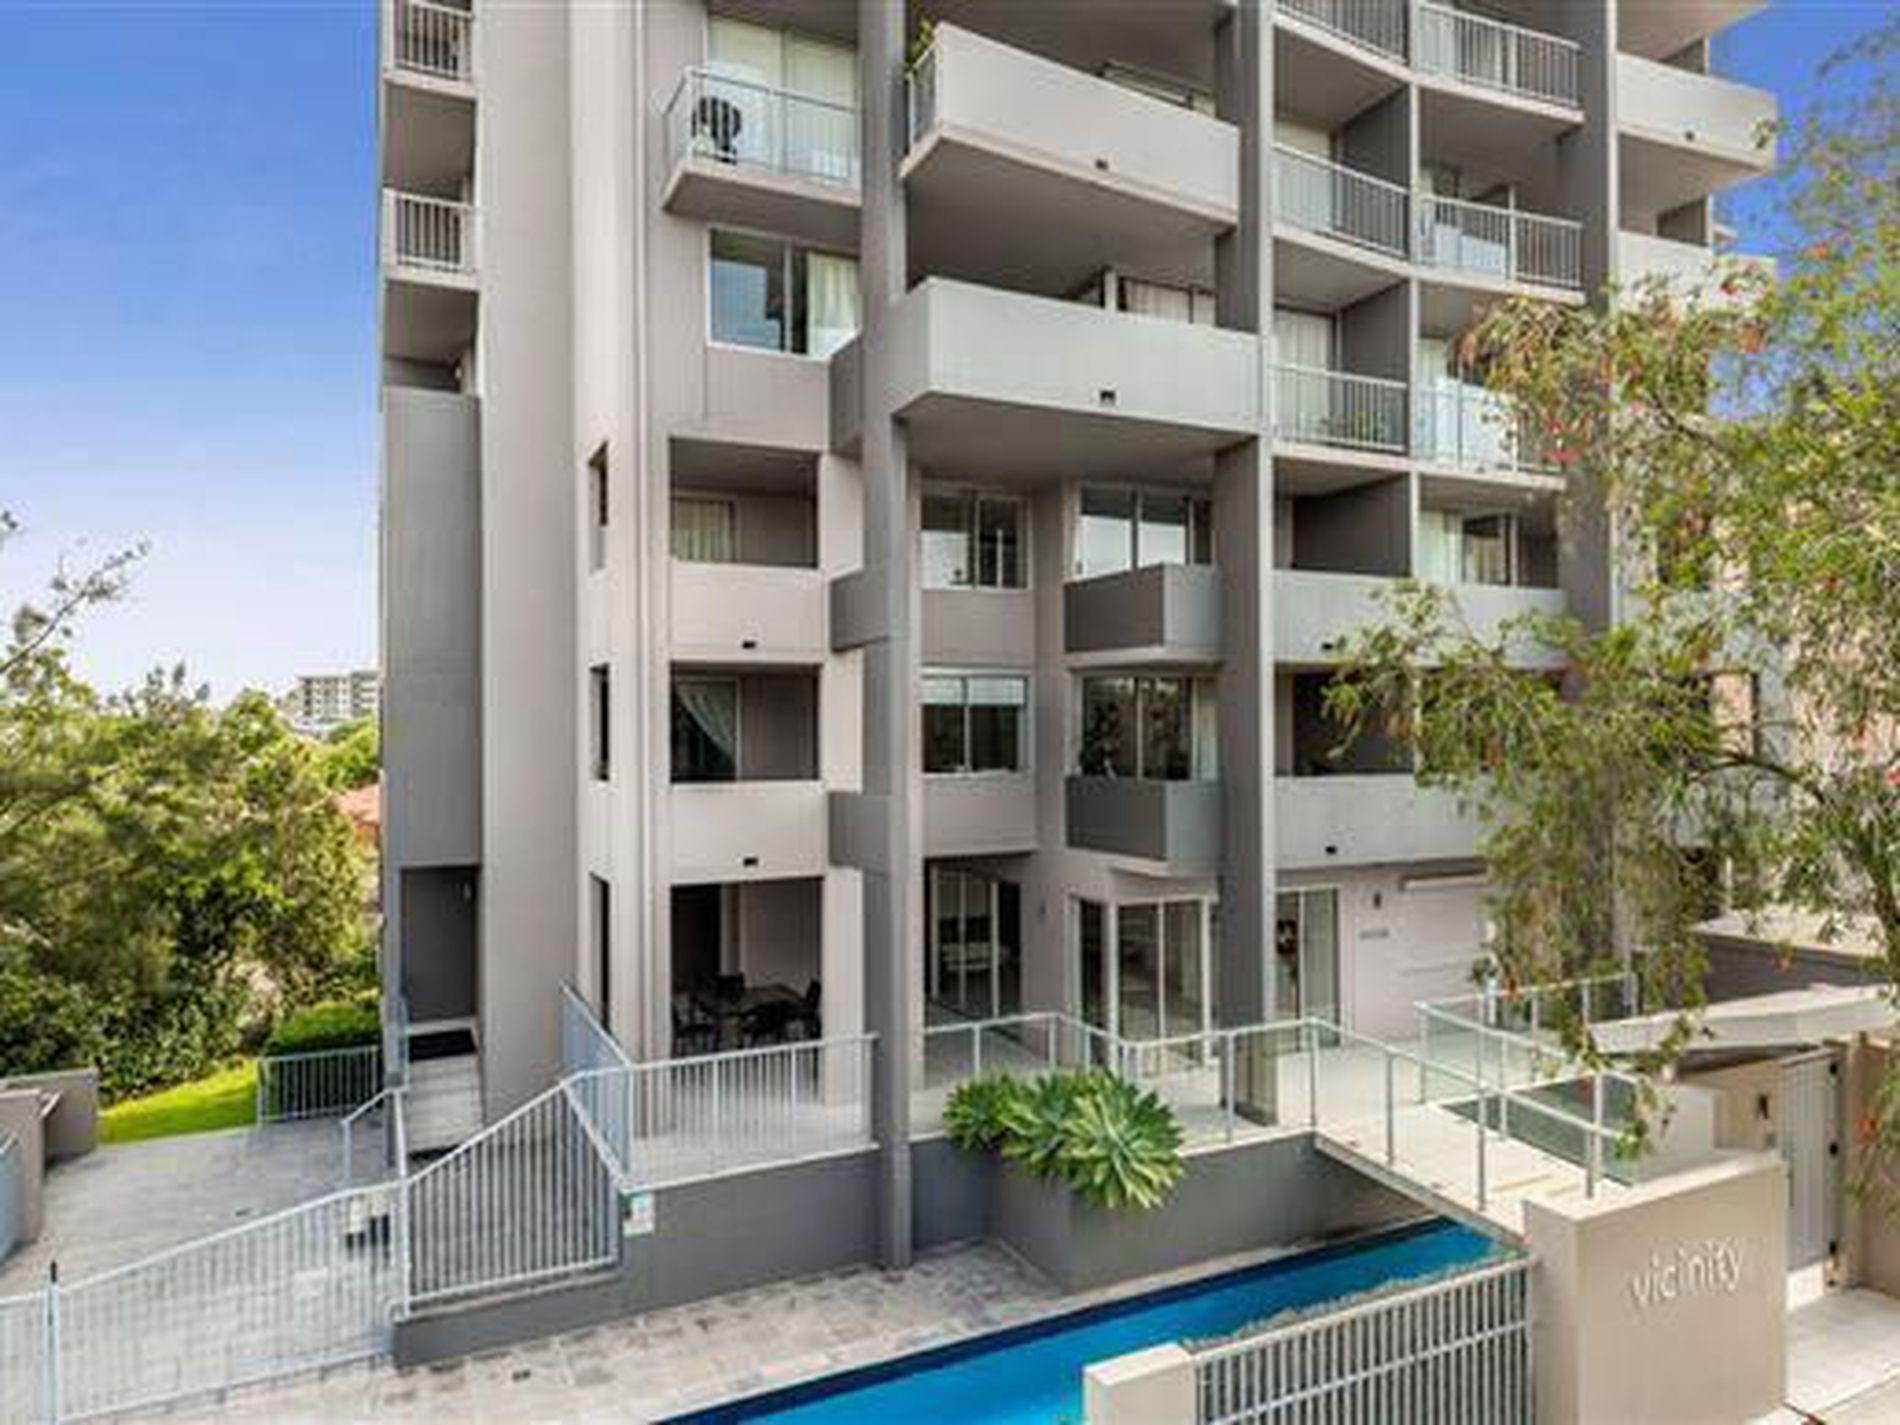 29 / 147-153 Lambert Street, Kangaroo Point